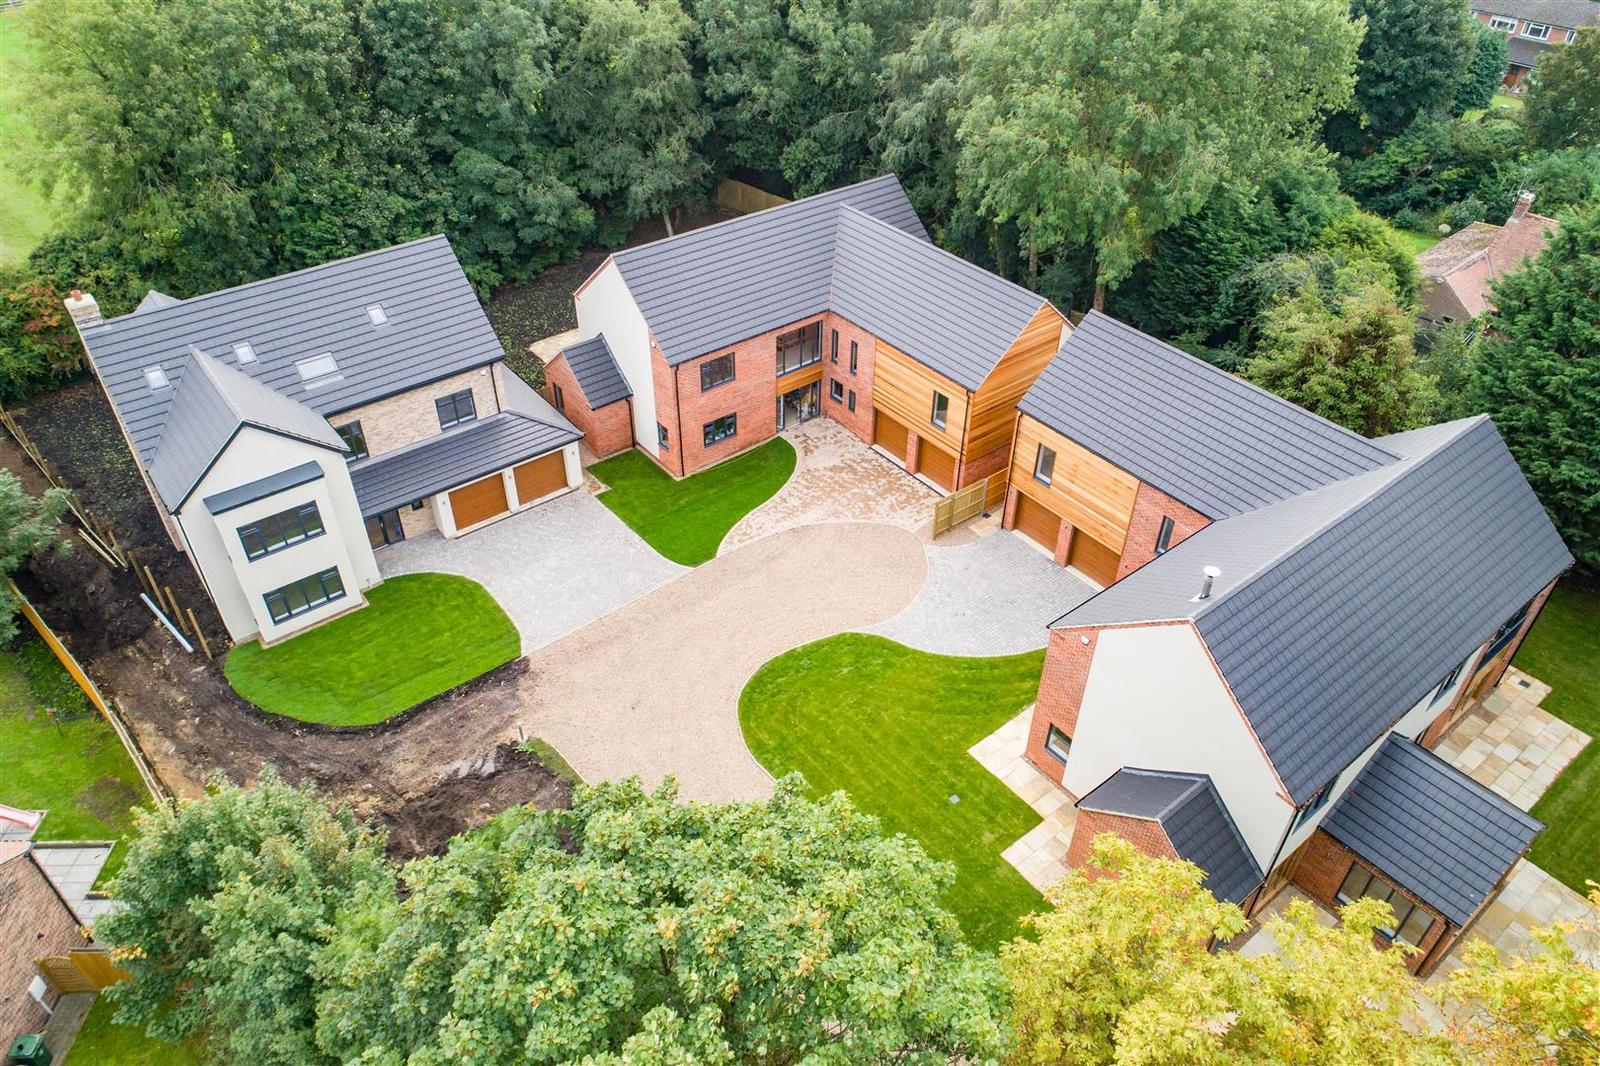 5 Bedrooms Property for sale in Chestnut Grange, Rectory Lane, Barrow...